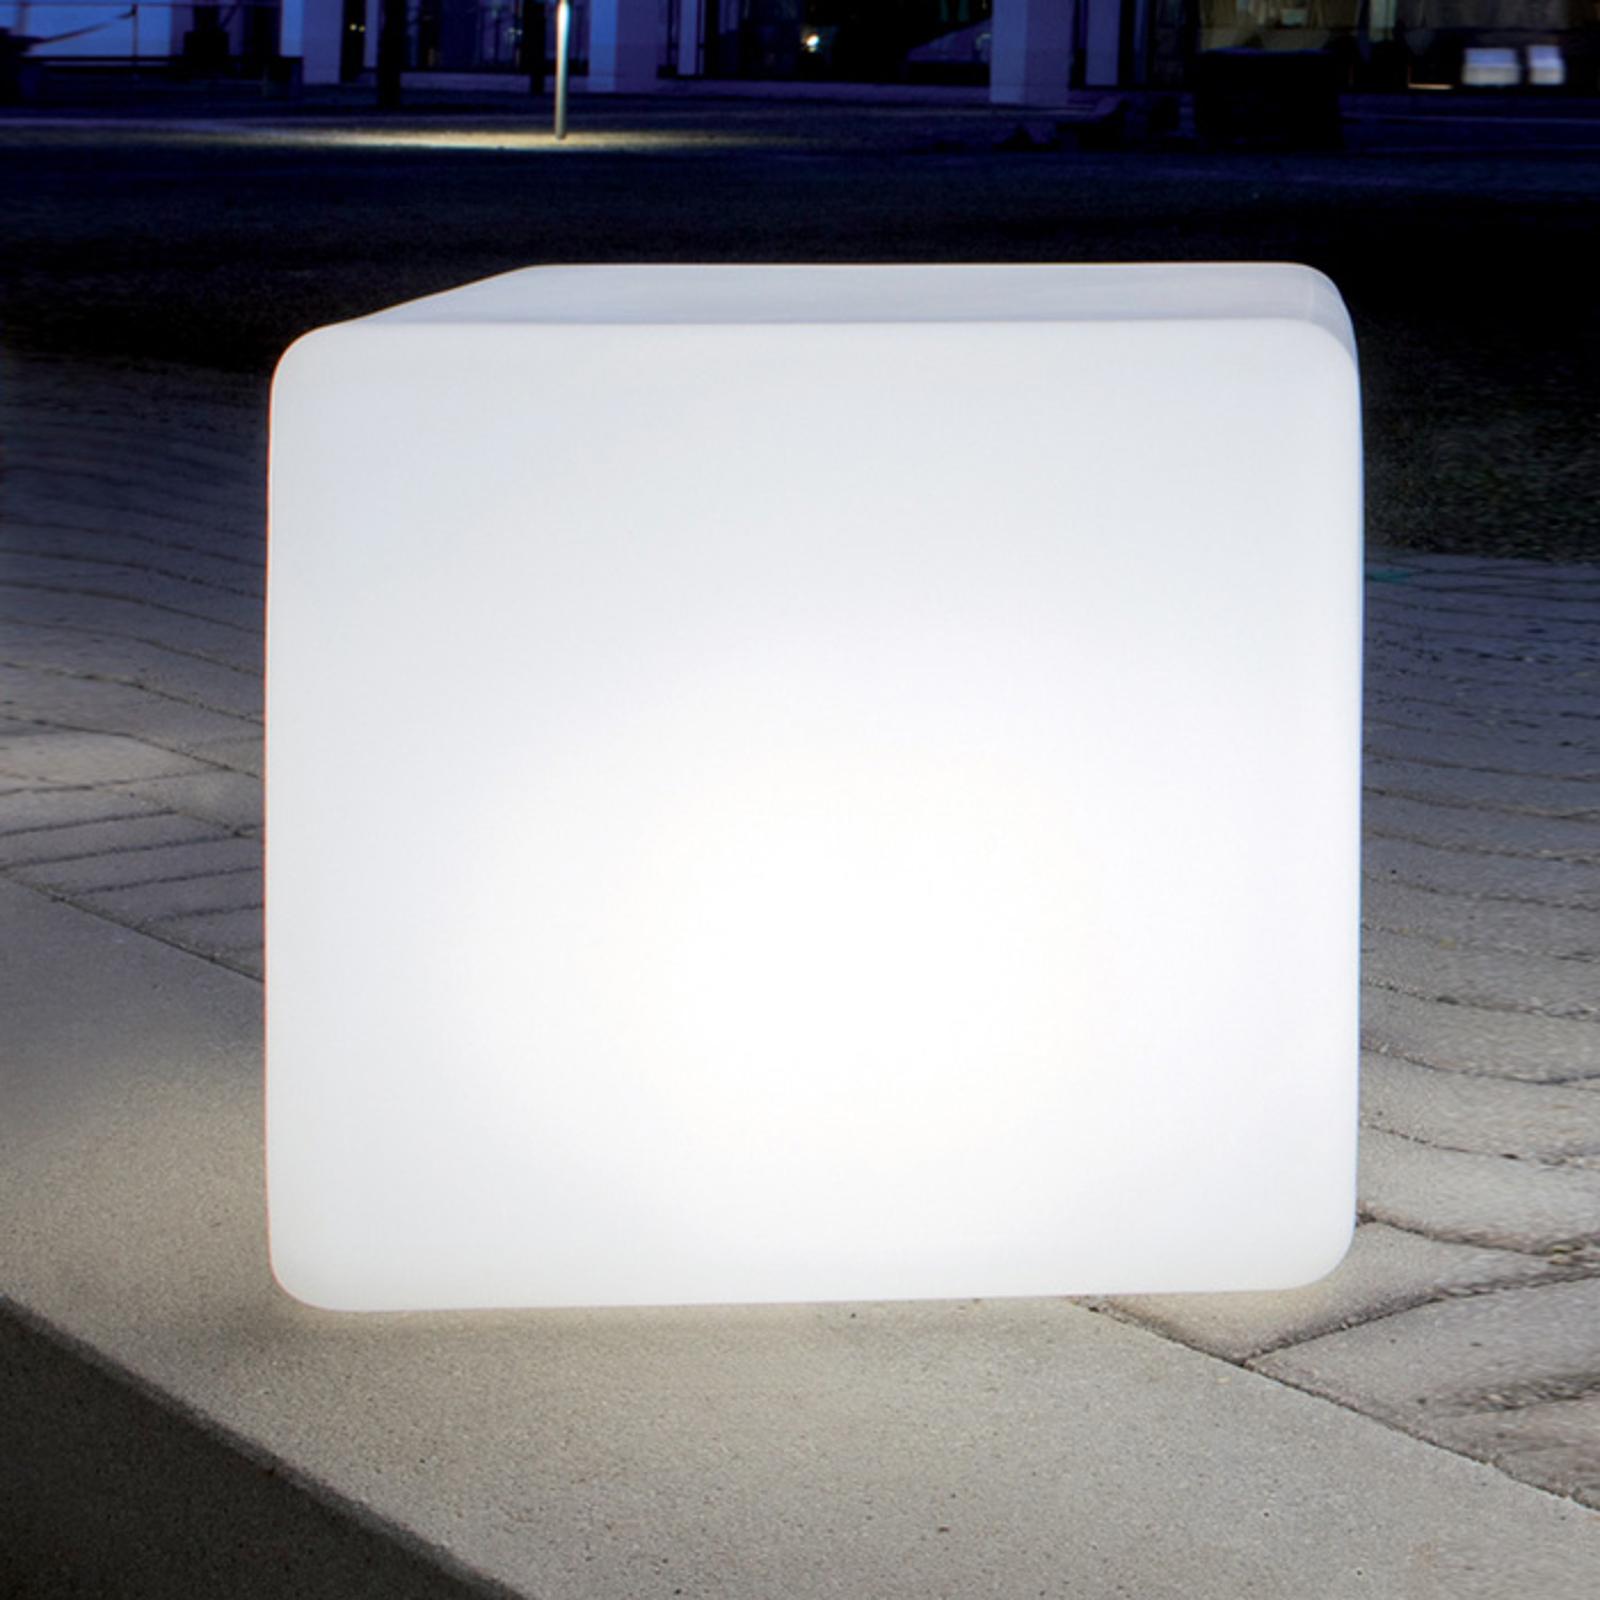 Eksklusiv Cube kubelampe, 45 cm